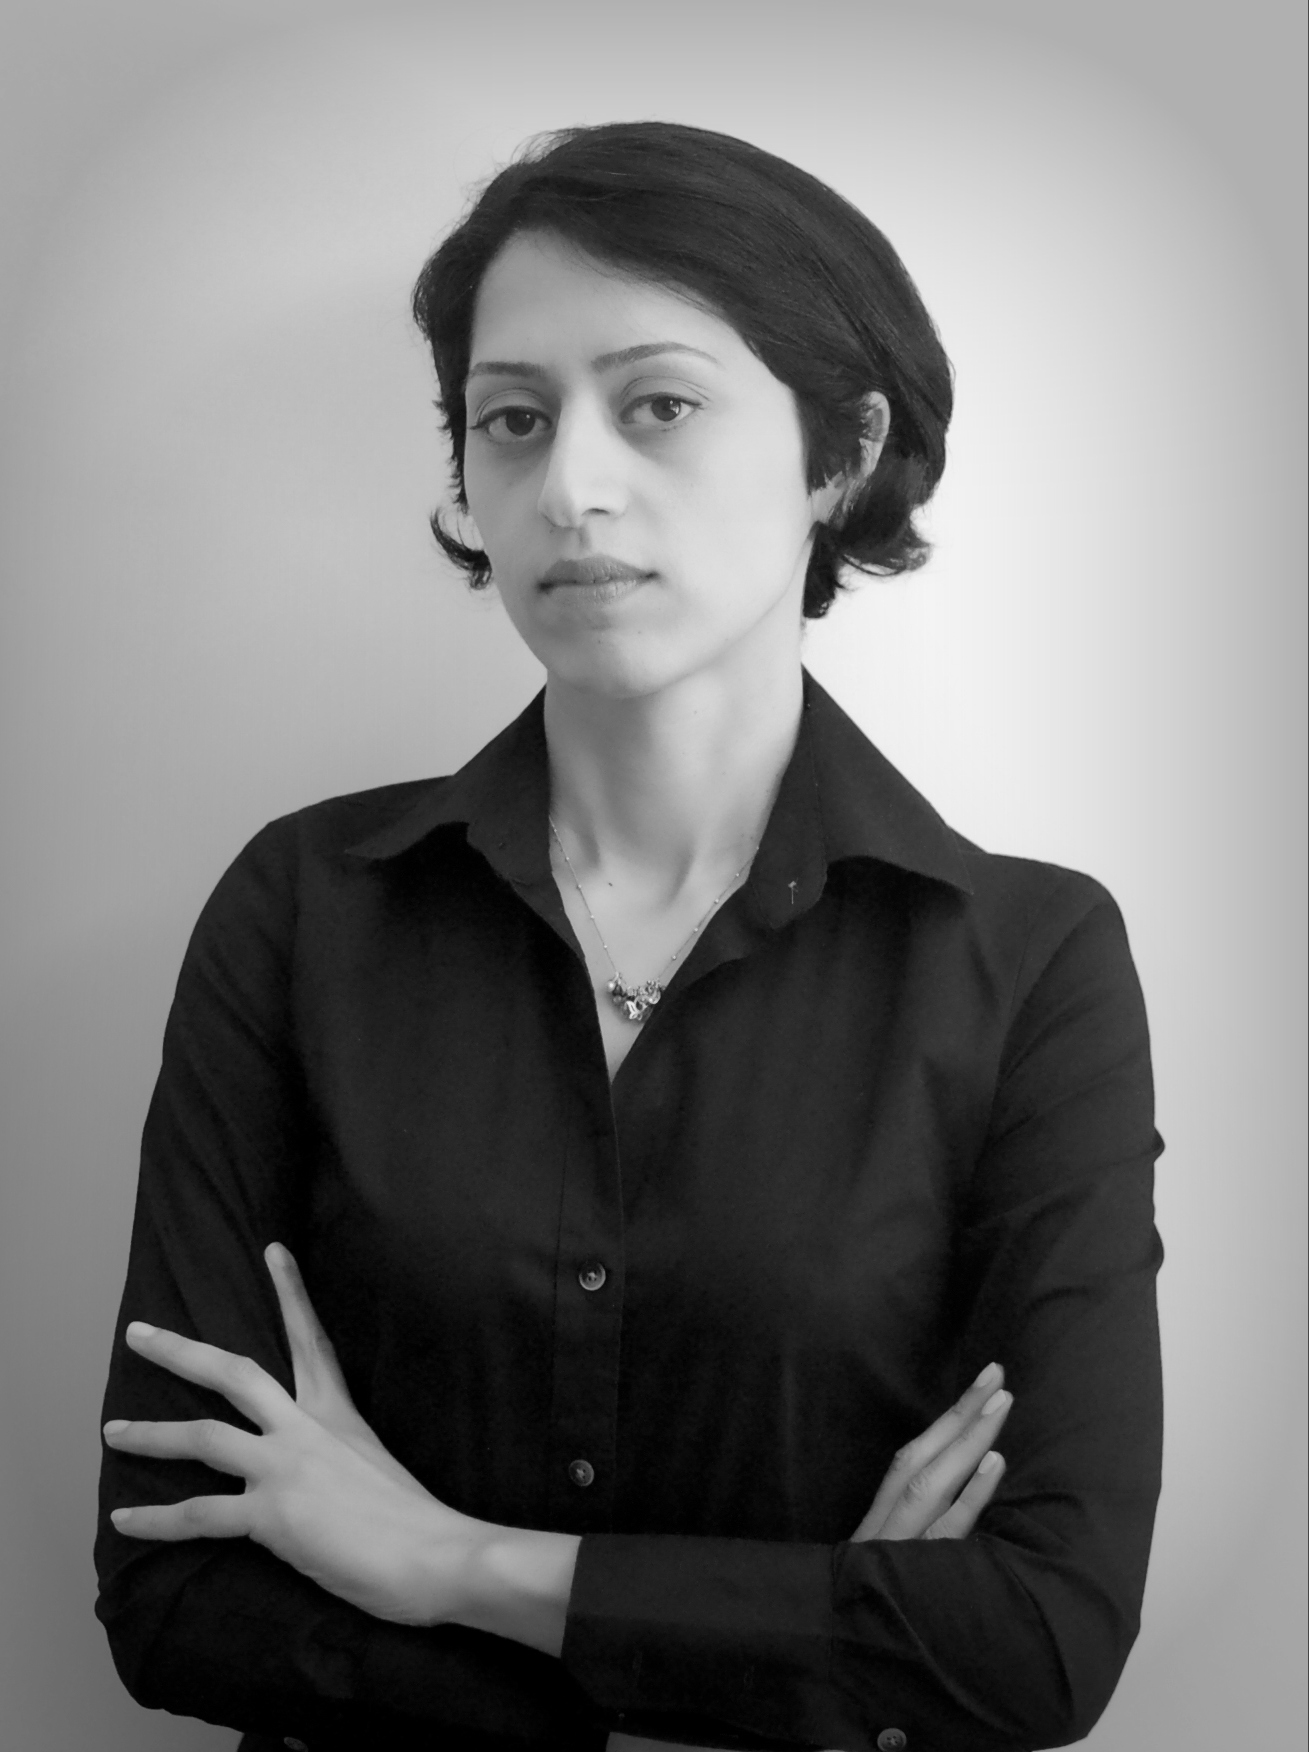 Dorna-Hakimi-Headshot.jpg